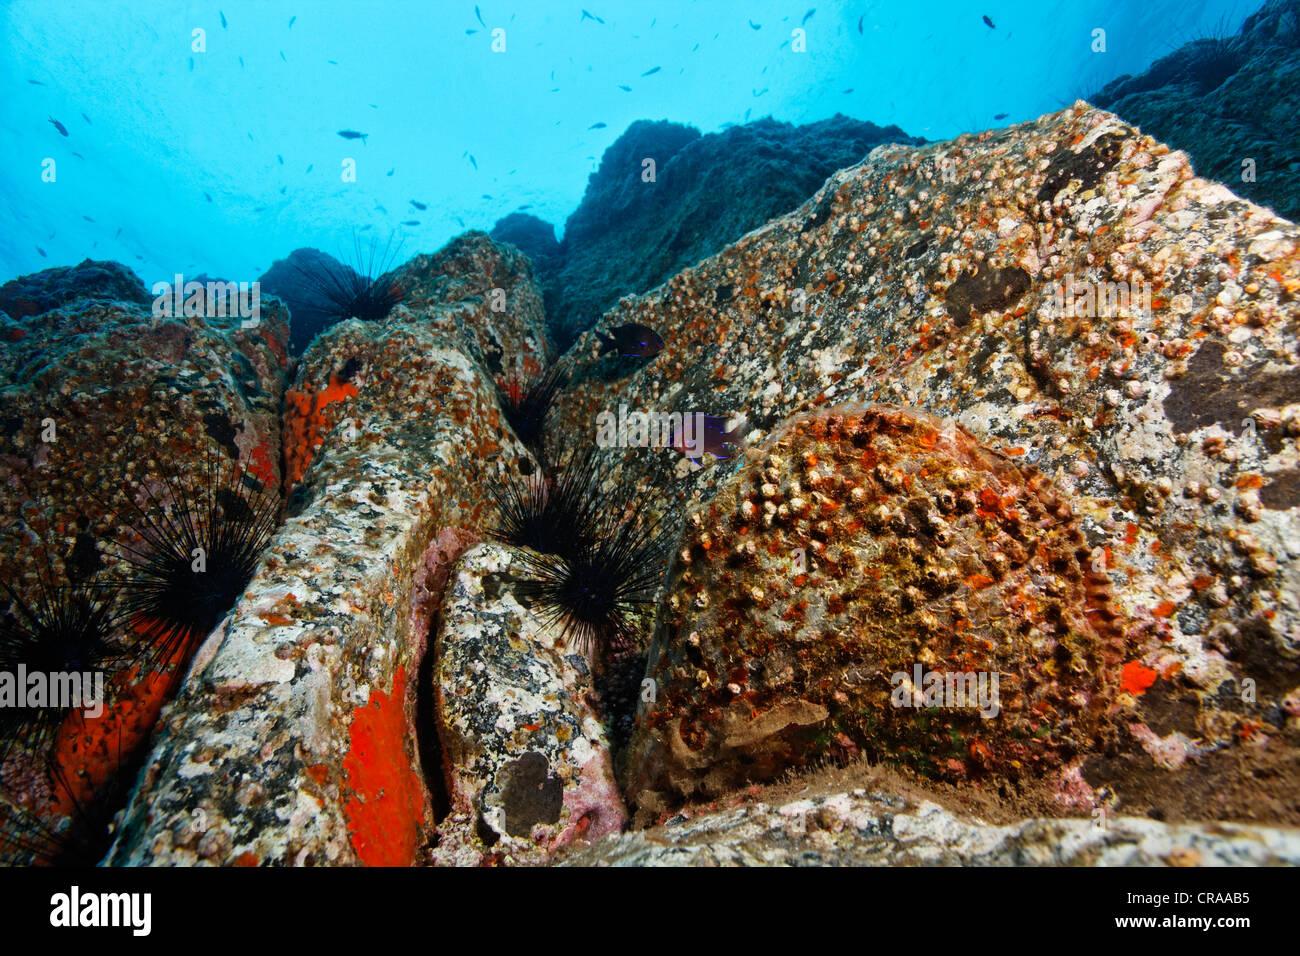 Stylo rugueux Shell (Pinna rudis), Acorn balanes (Balanus trigonus), des rochers, des crevasses rocheuses, Madeira, Photo Stock